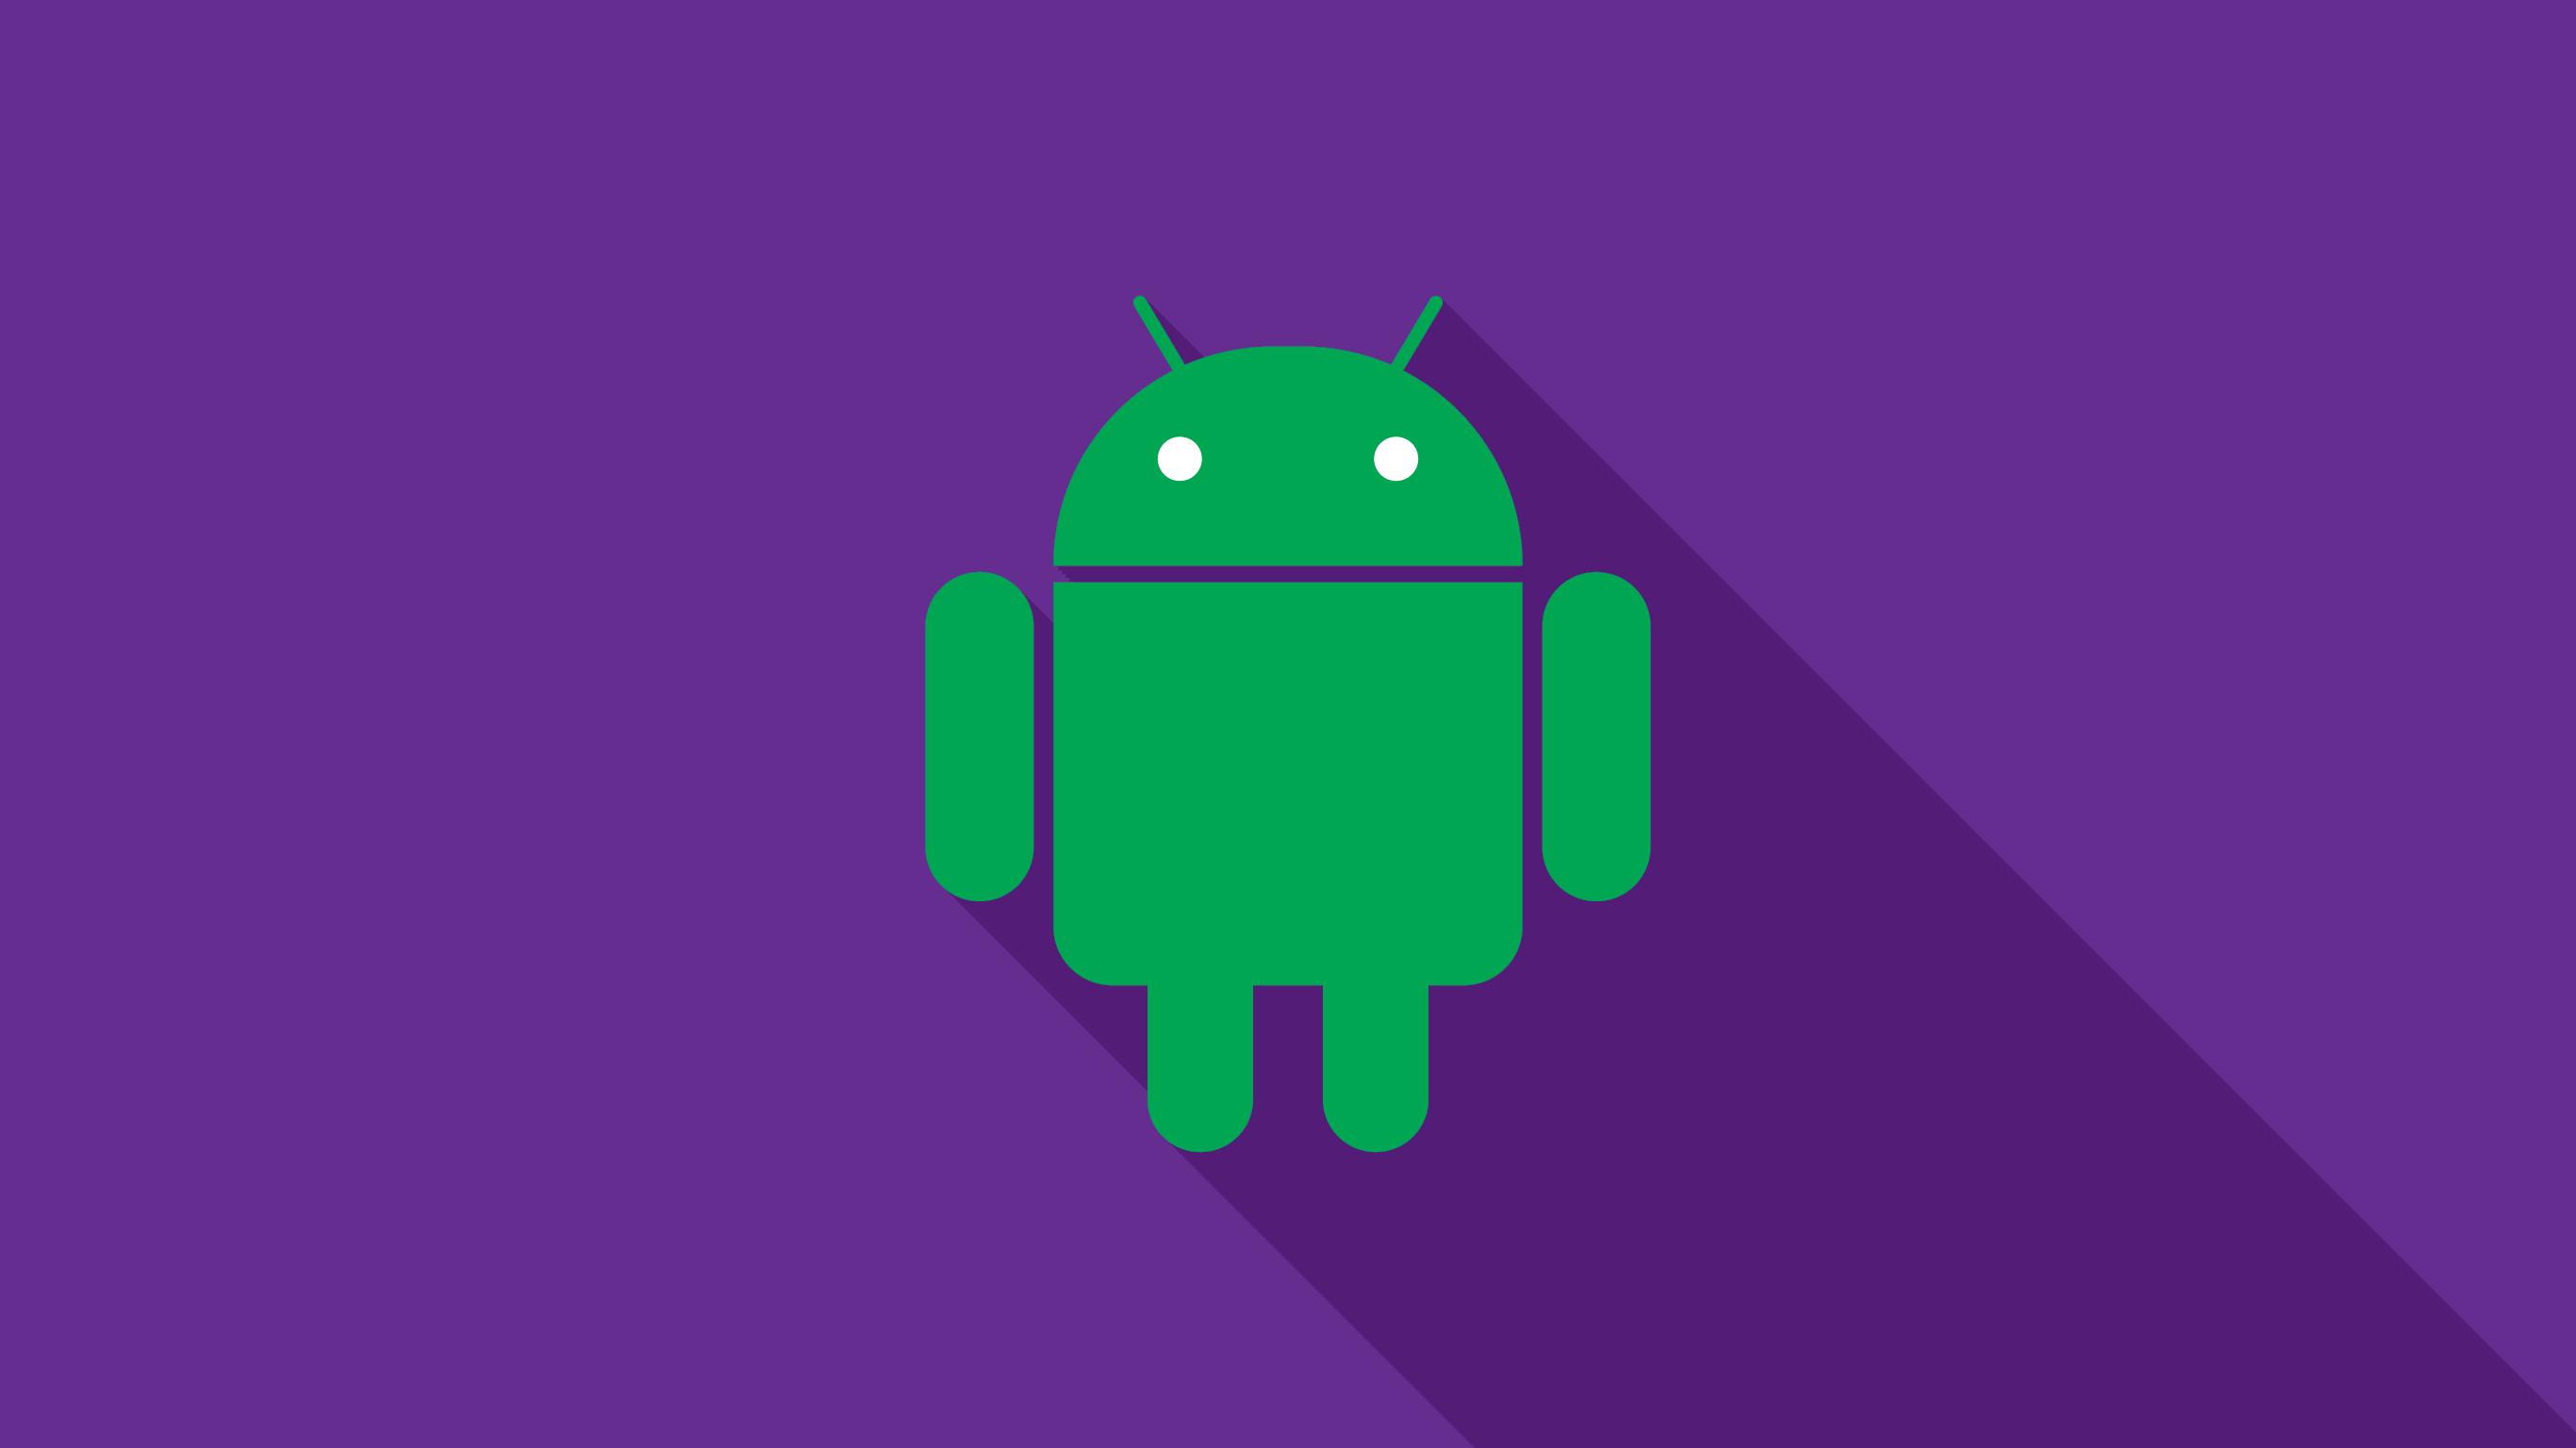 Андроид Программа Обои Бесплатно